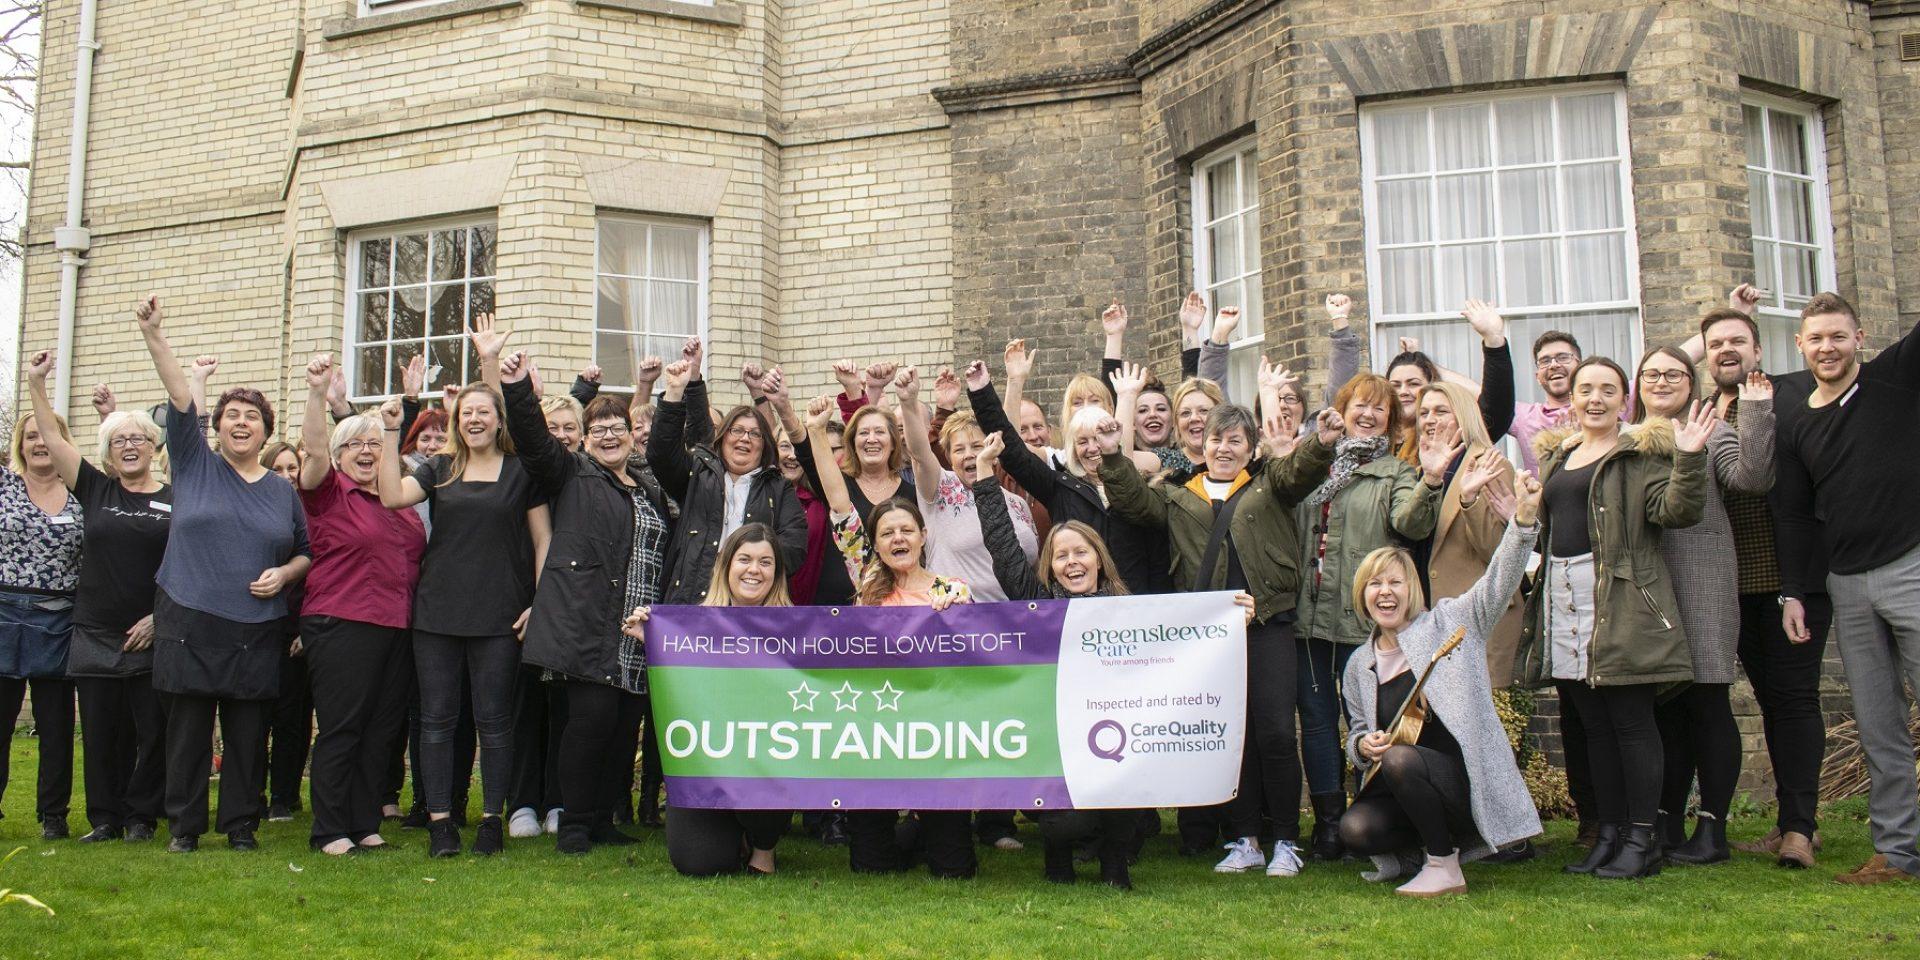 Harleston House in Lowestoft celebrates Outstanding CQC rating